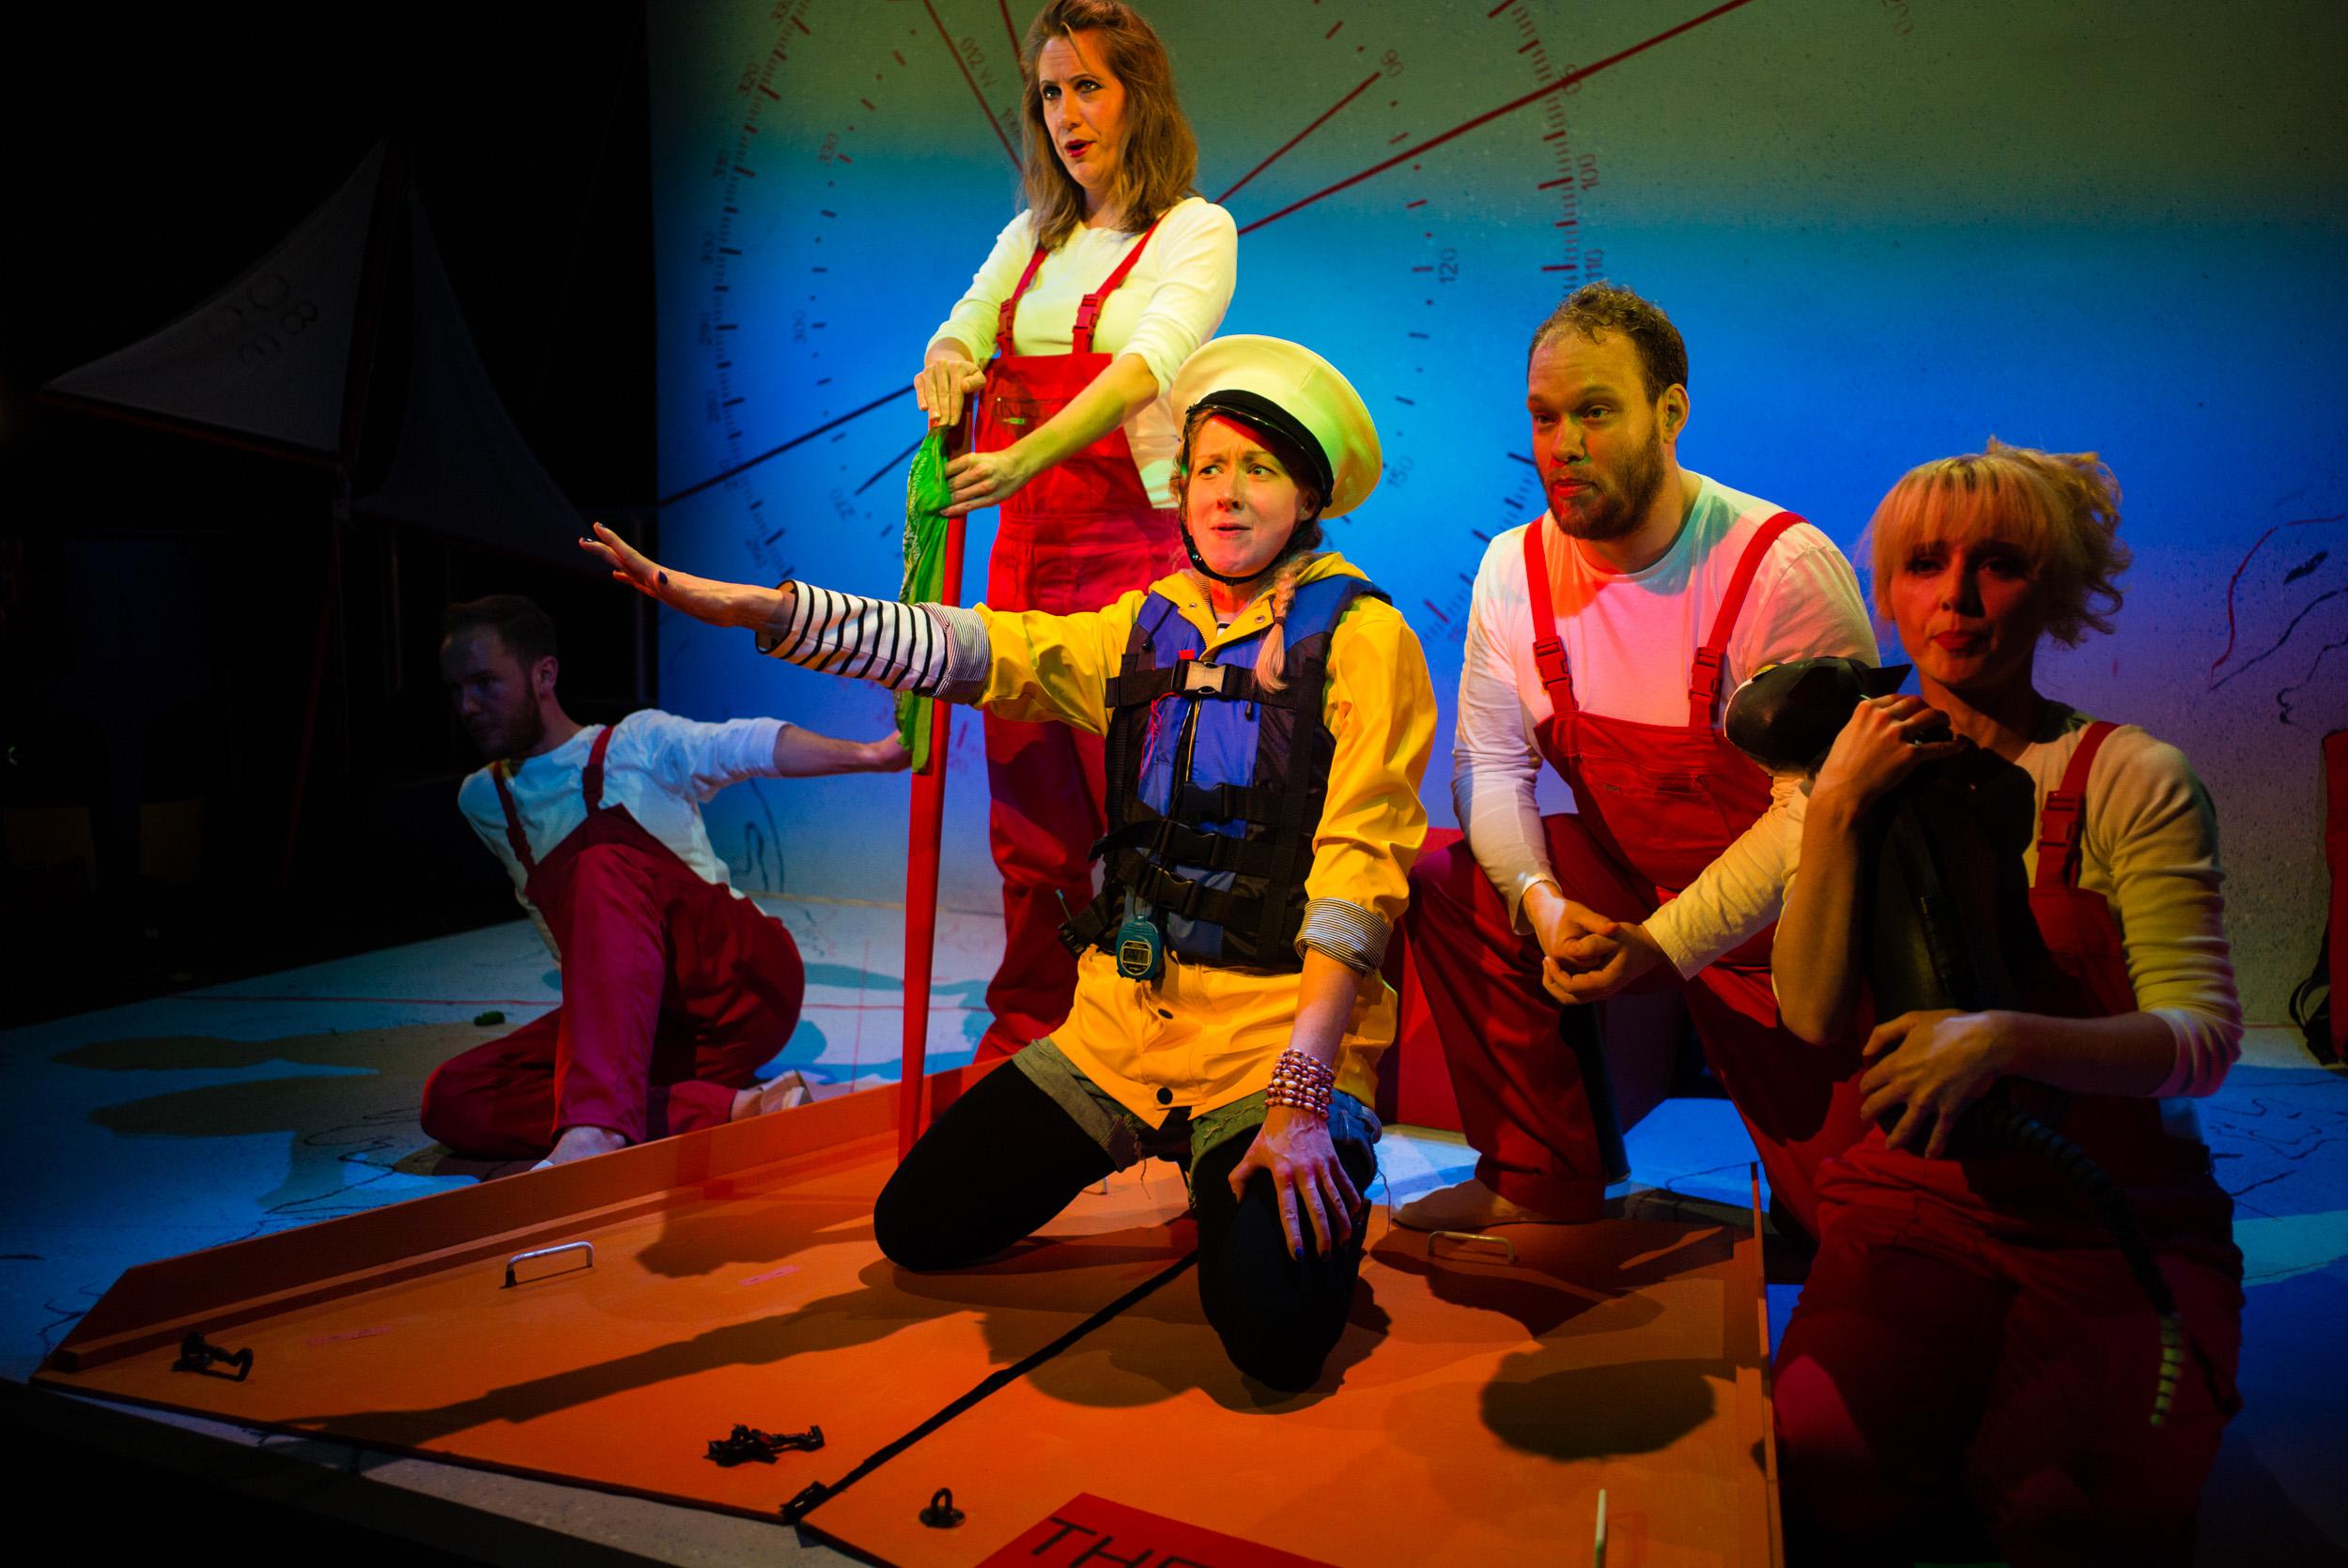 Ulla's Odyssey. OperaUpClose, Kings Place. Oskar McCarthy, Flora McIntosh, Sarah Minns, Edward Hughes & Pamela Hay. Photo by Christopher Tribble.